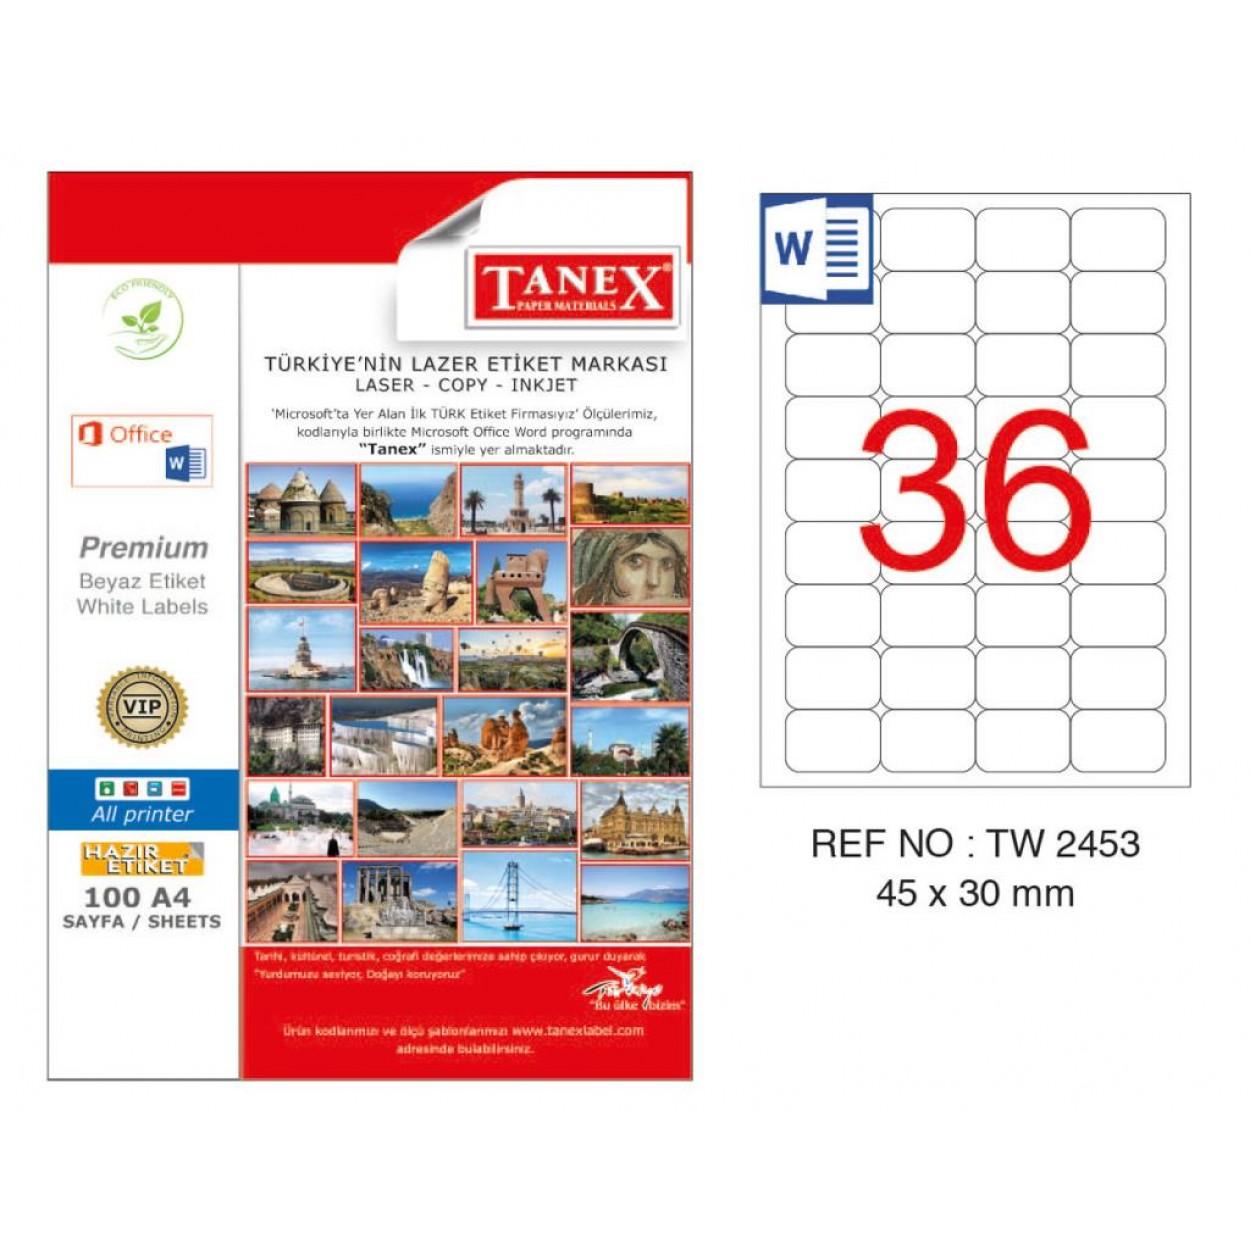 Tanex TW-2453 45x30mm Kuşe Lazer Etiket 100 Lü Paket